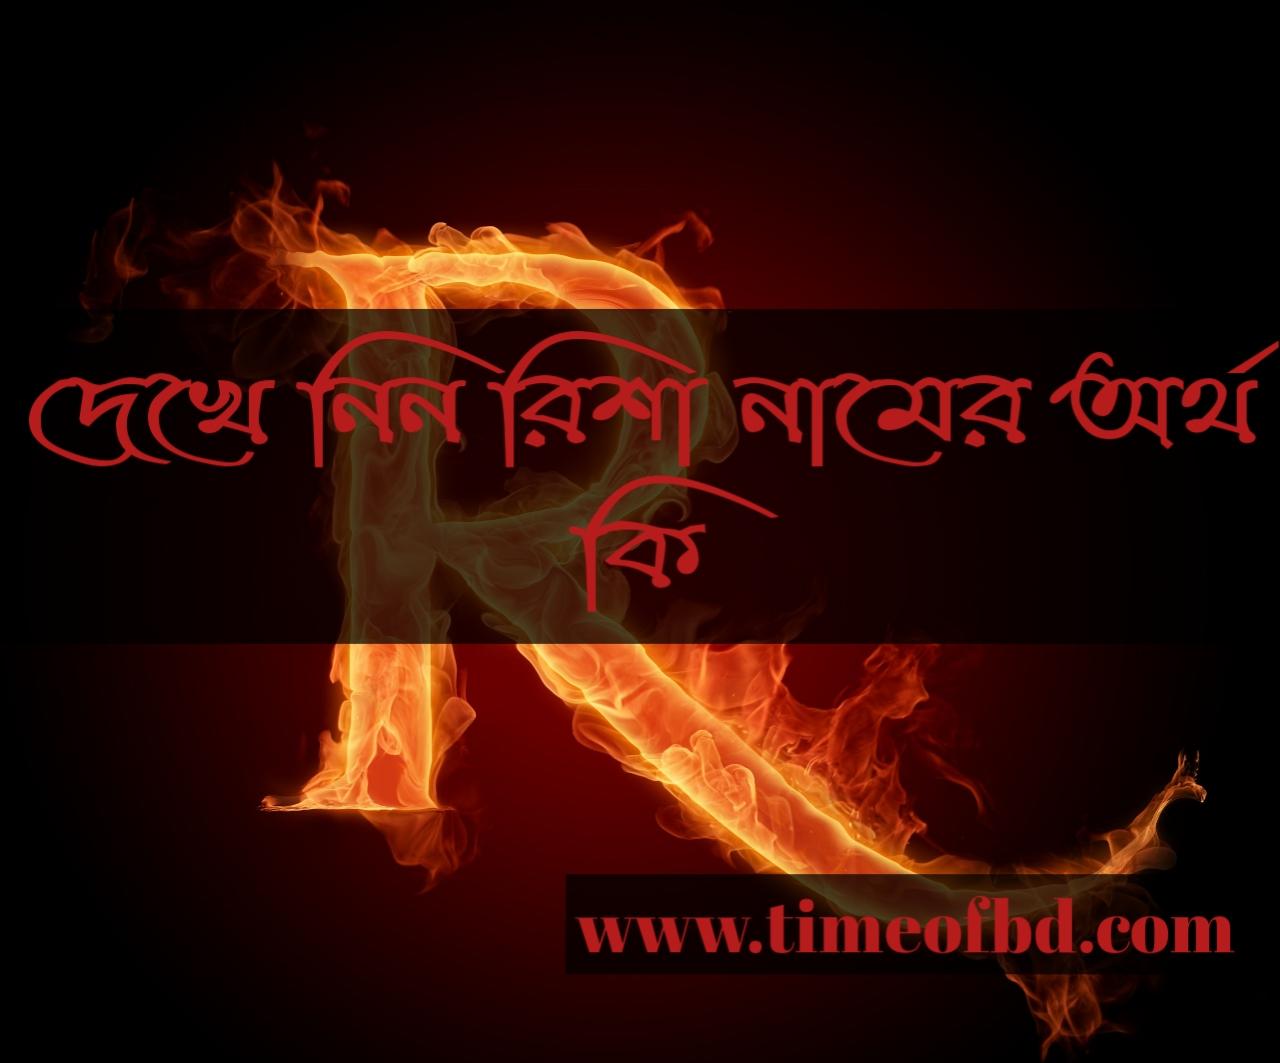 risha name meaning in Bengali, রিশা নামের অর্থ কি, রিশা নামের বাংলা অর্থ কি, রিশা নামের ইসলামিক অর্থ কি,